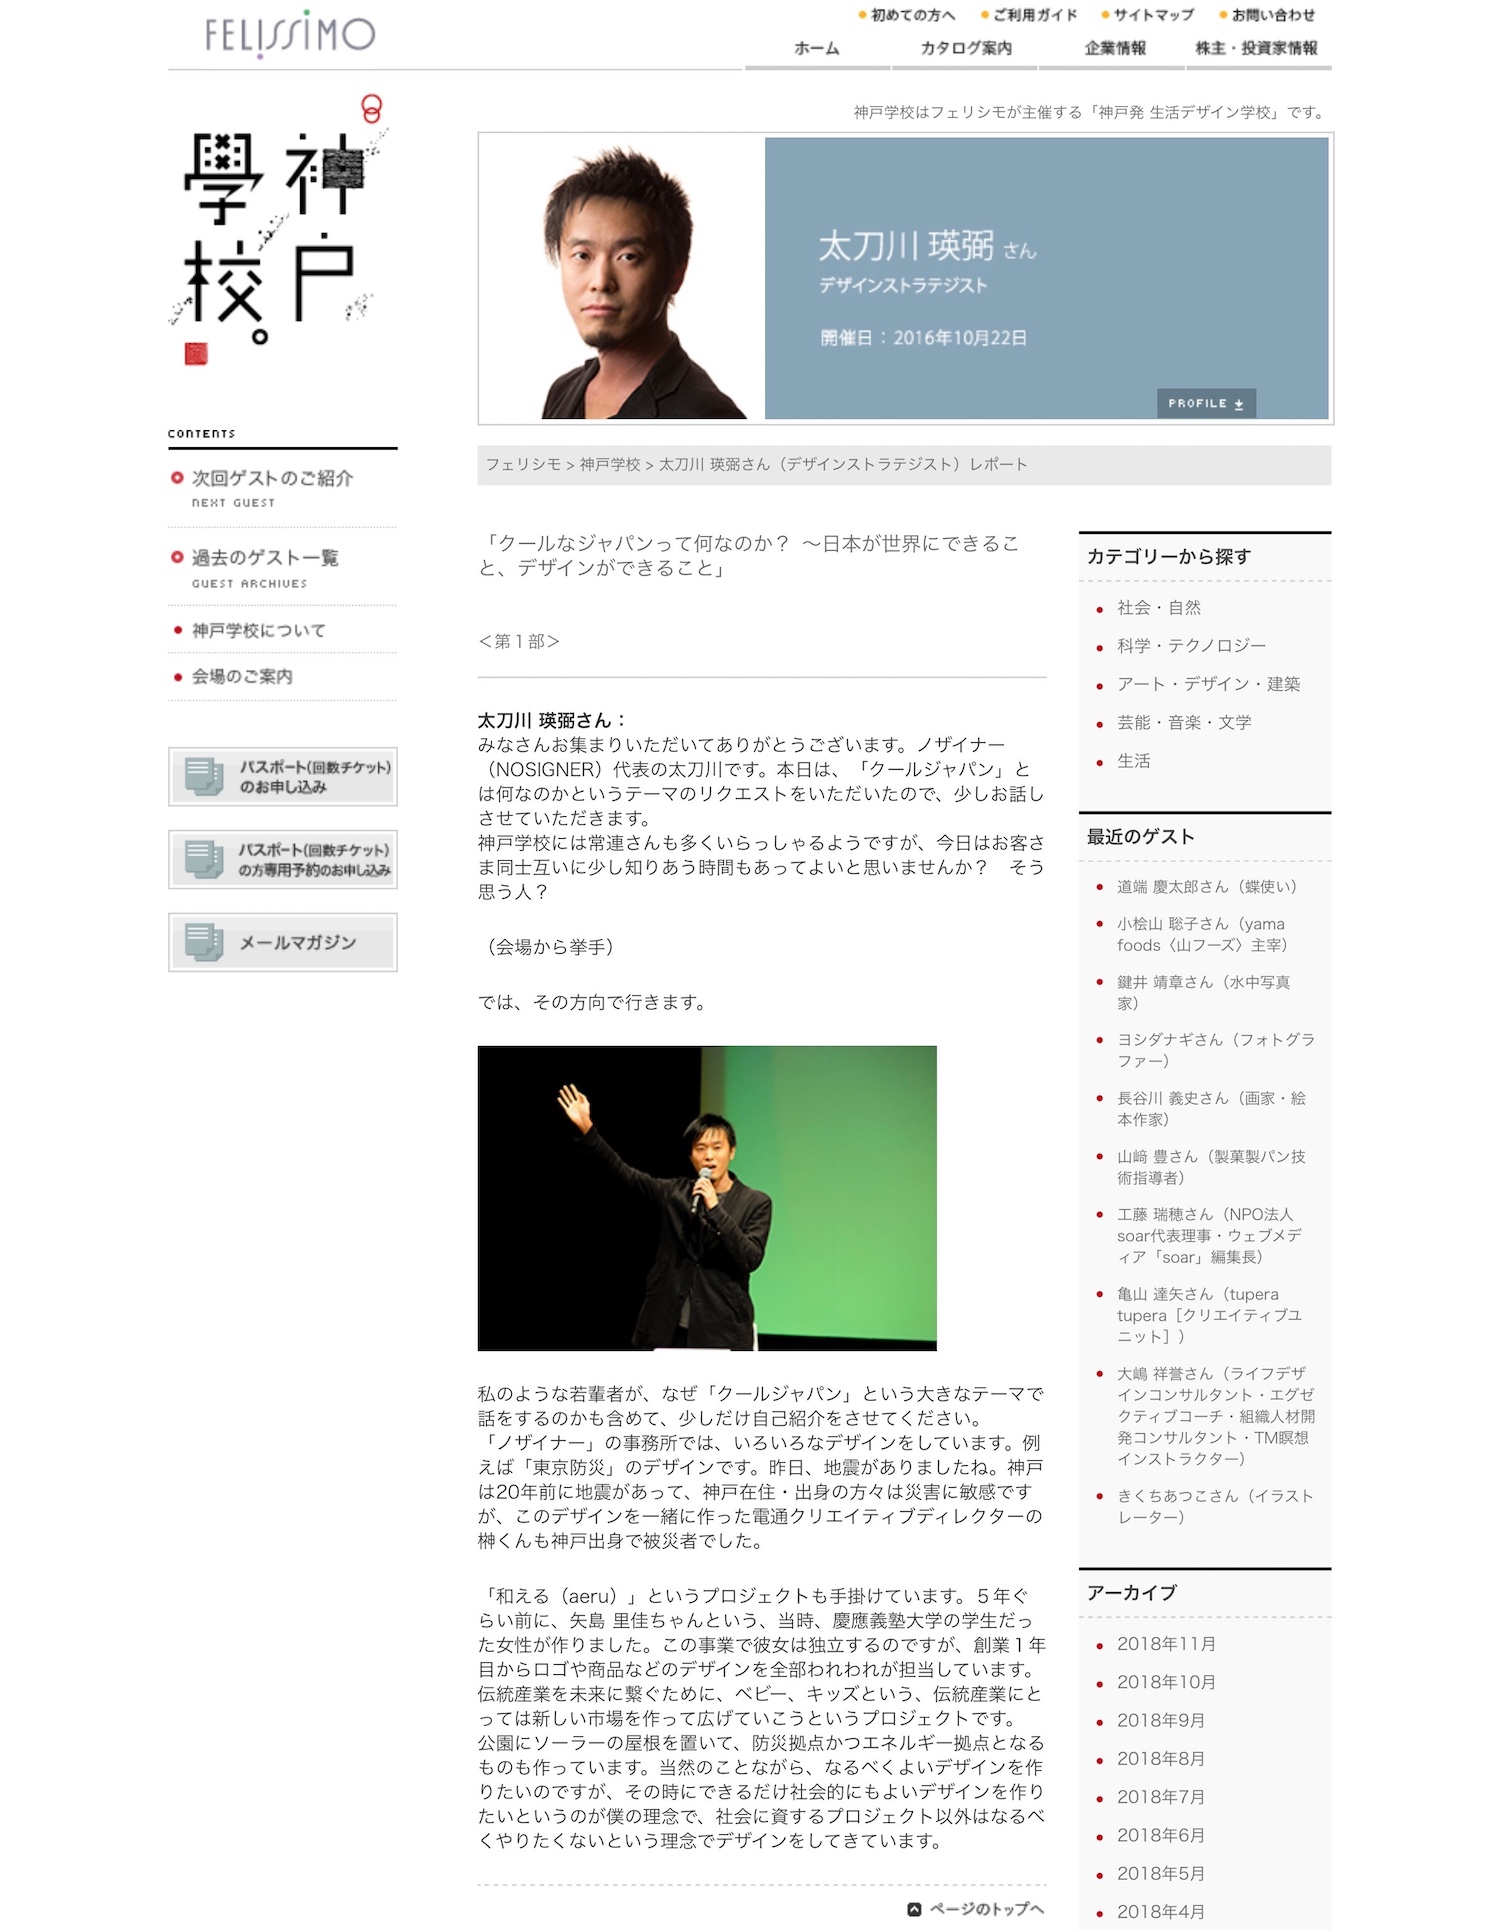 16.Ro 神戸学校2.JPG